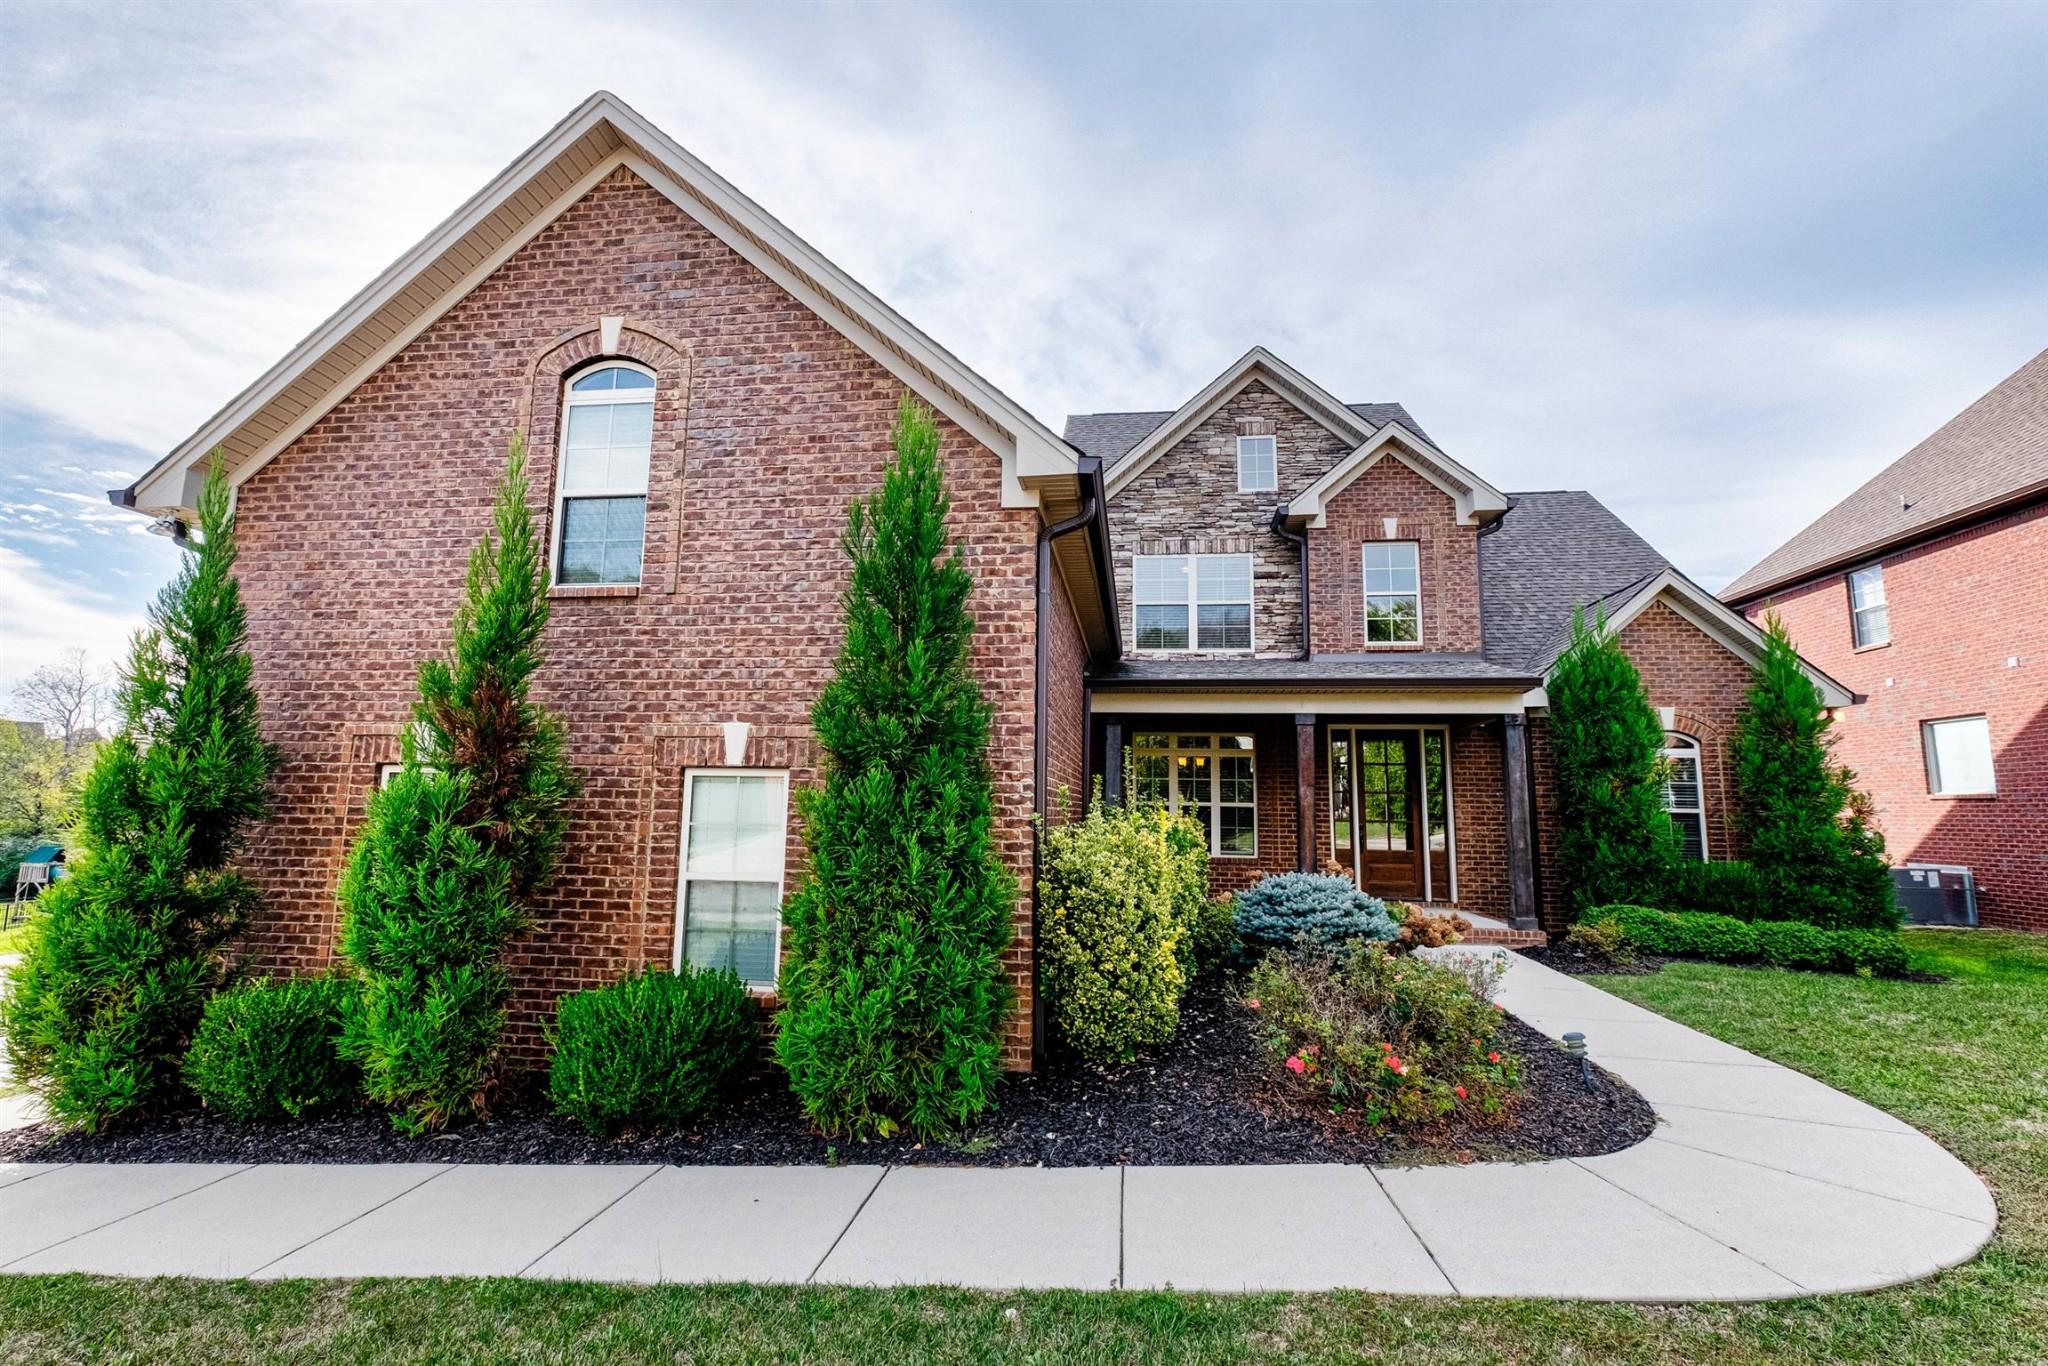 8009 Fenwick Ln, Spring Hill, Tennessee